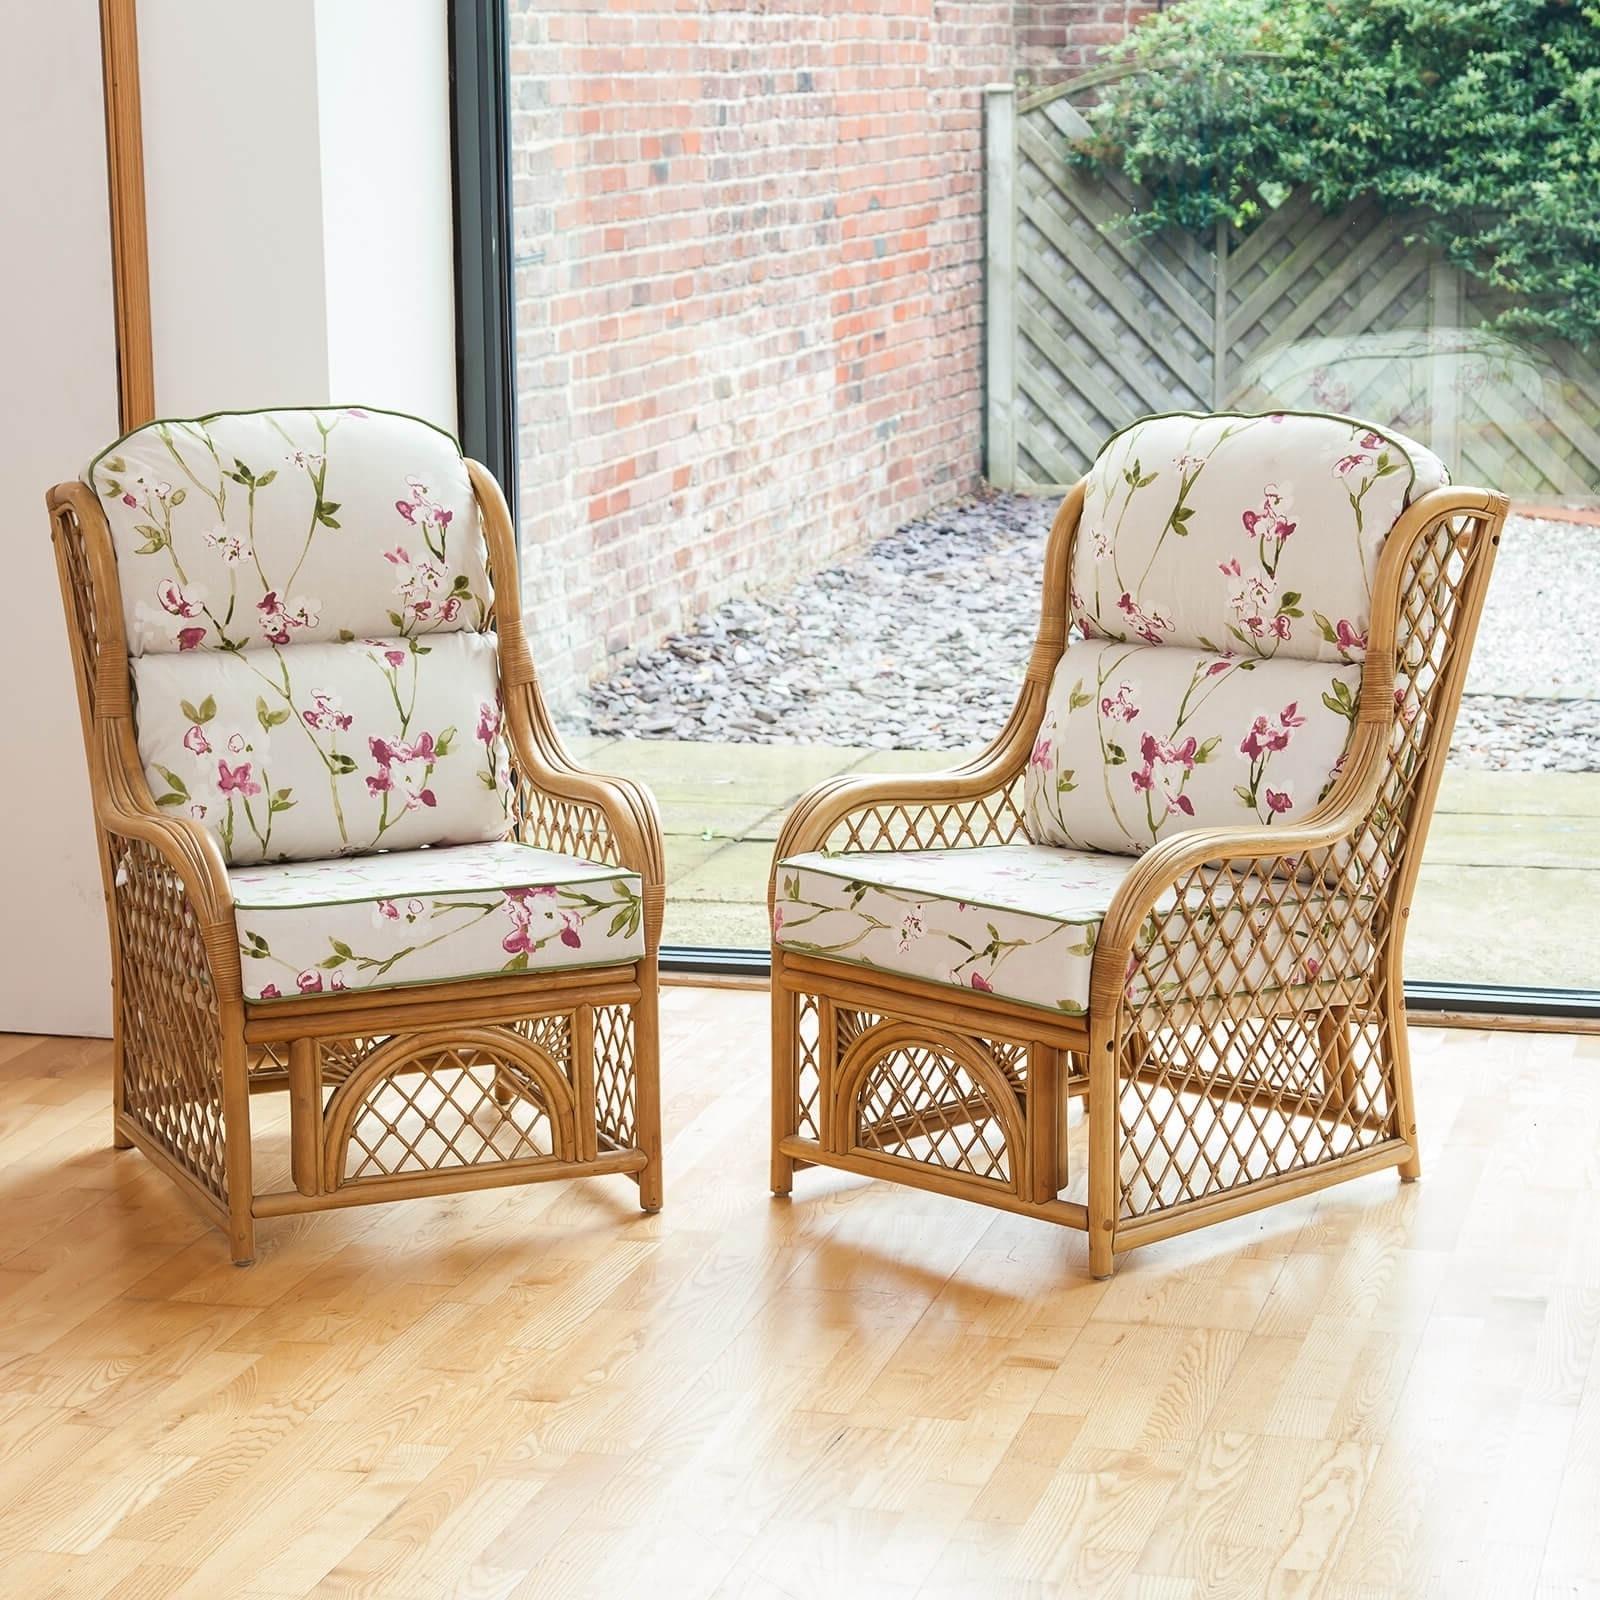 Preferred Armchair : Chintz Drapes Chintz Fabricthe Yard Chintz Fabric With Chintz Sofas (View 13 of 15)